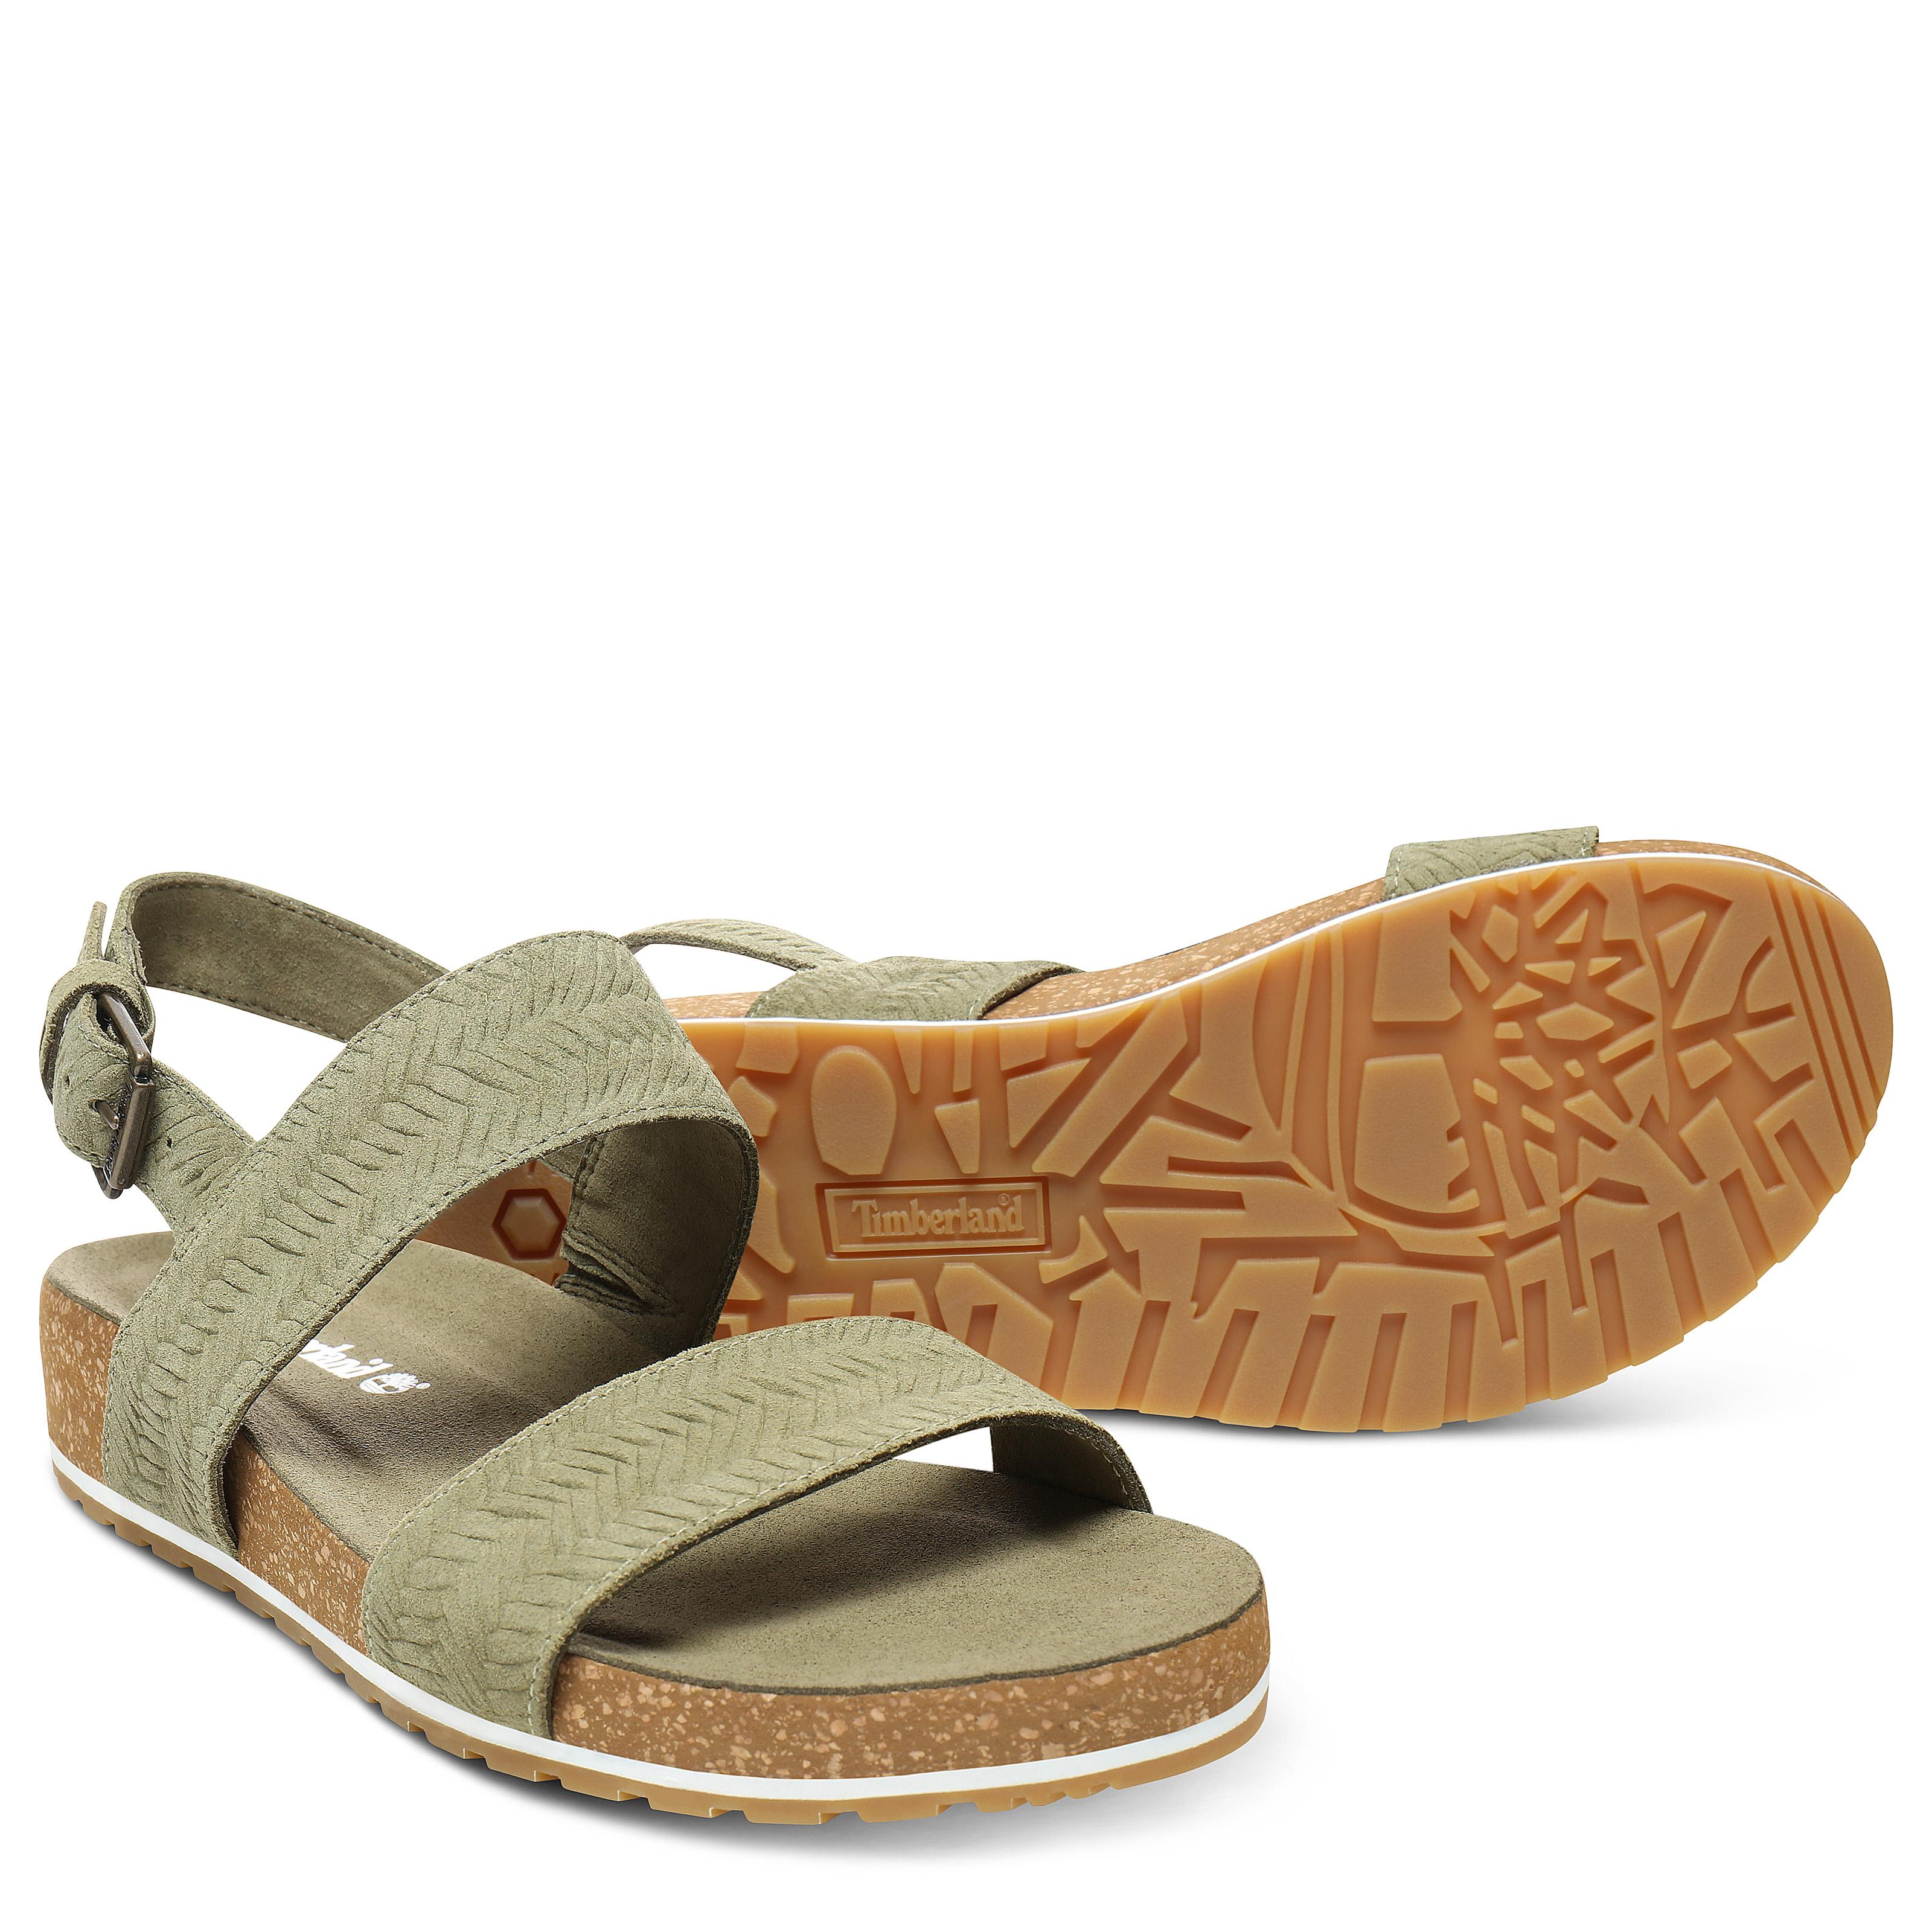 386650a8 Malibu Waves 2 Band Sandal